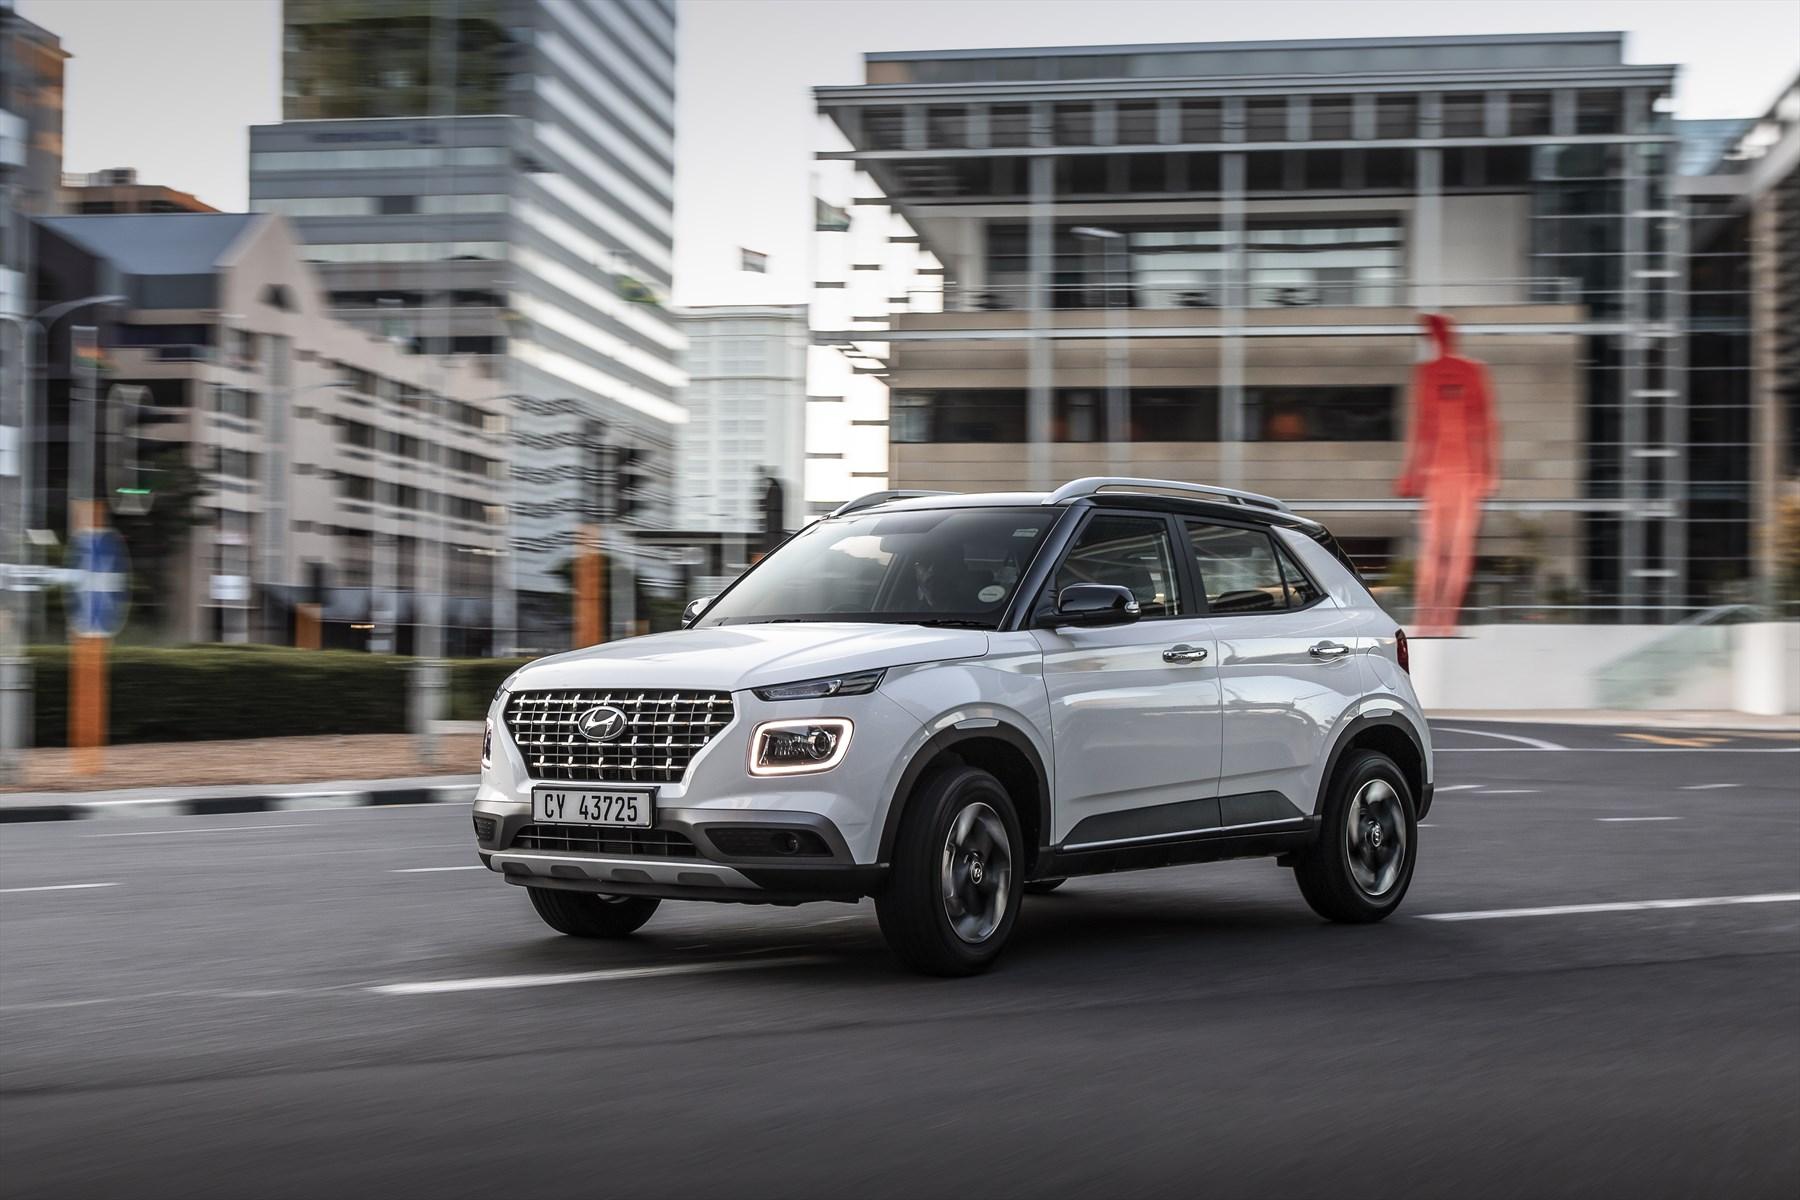 Hyundai Venue | compact SUV | 1.0-litre turbocharged